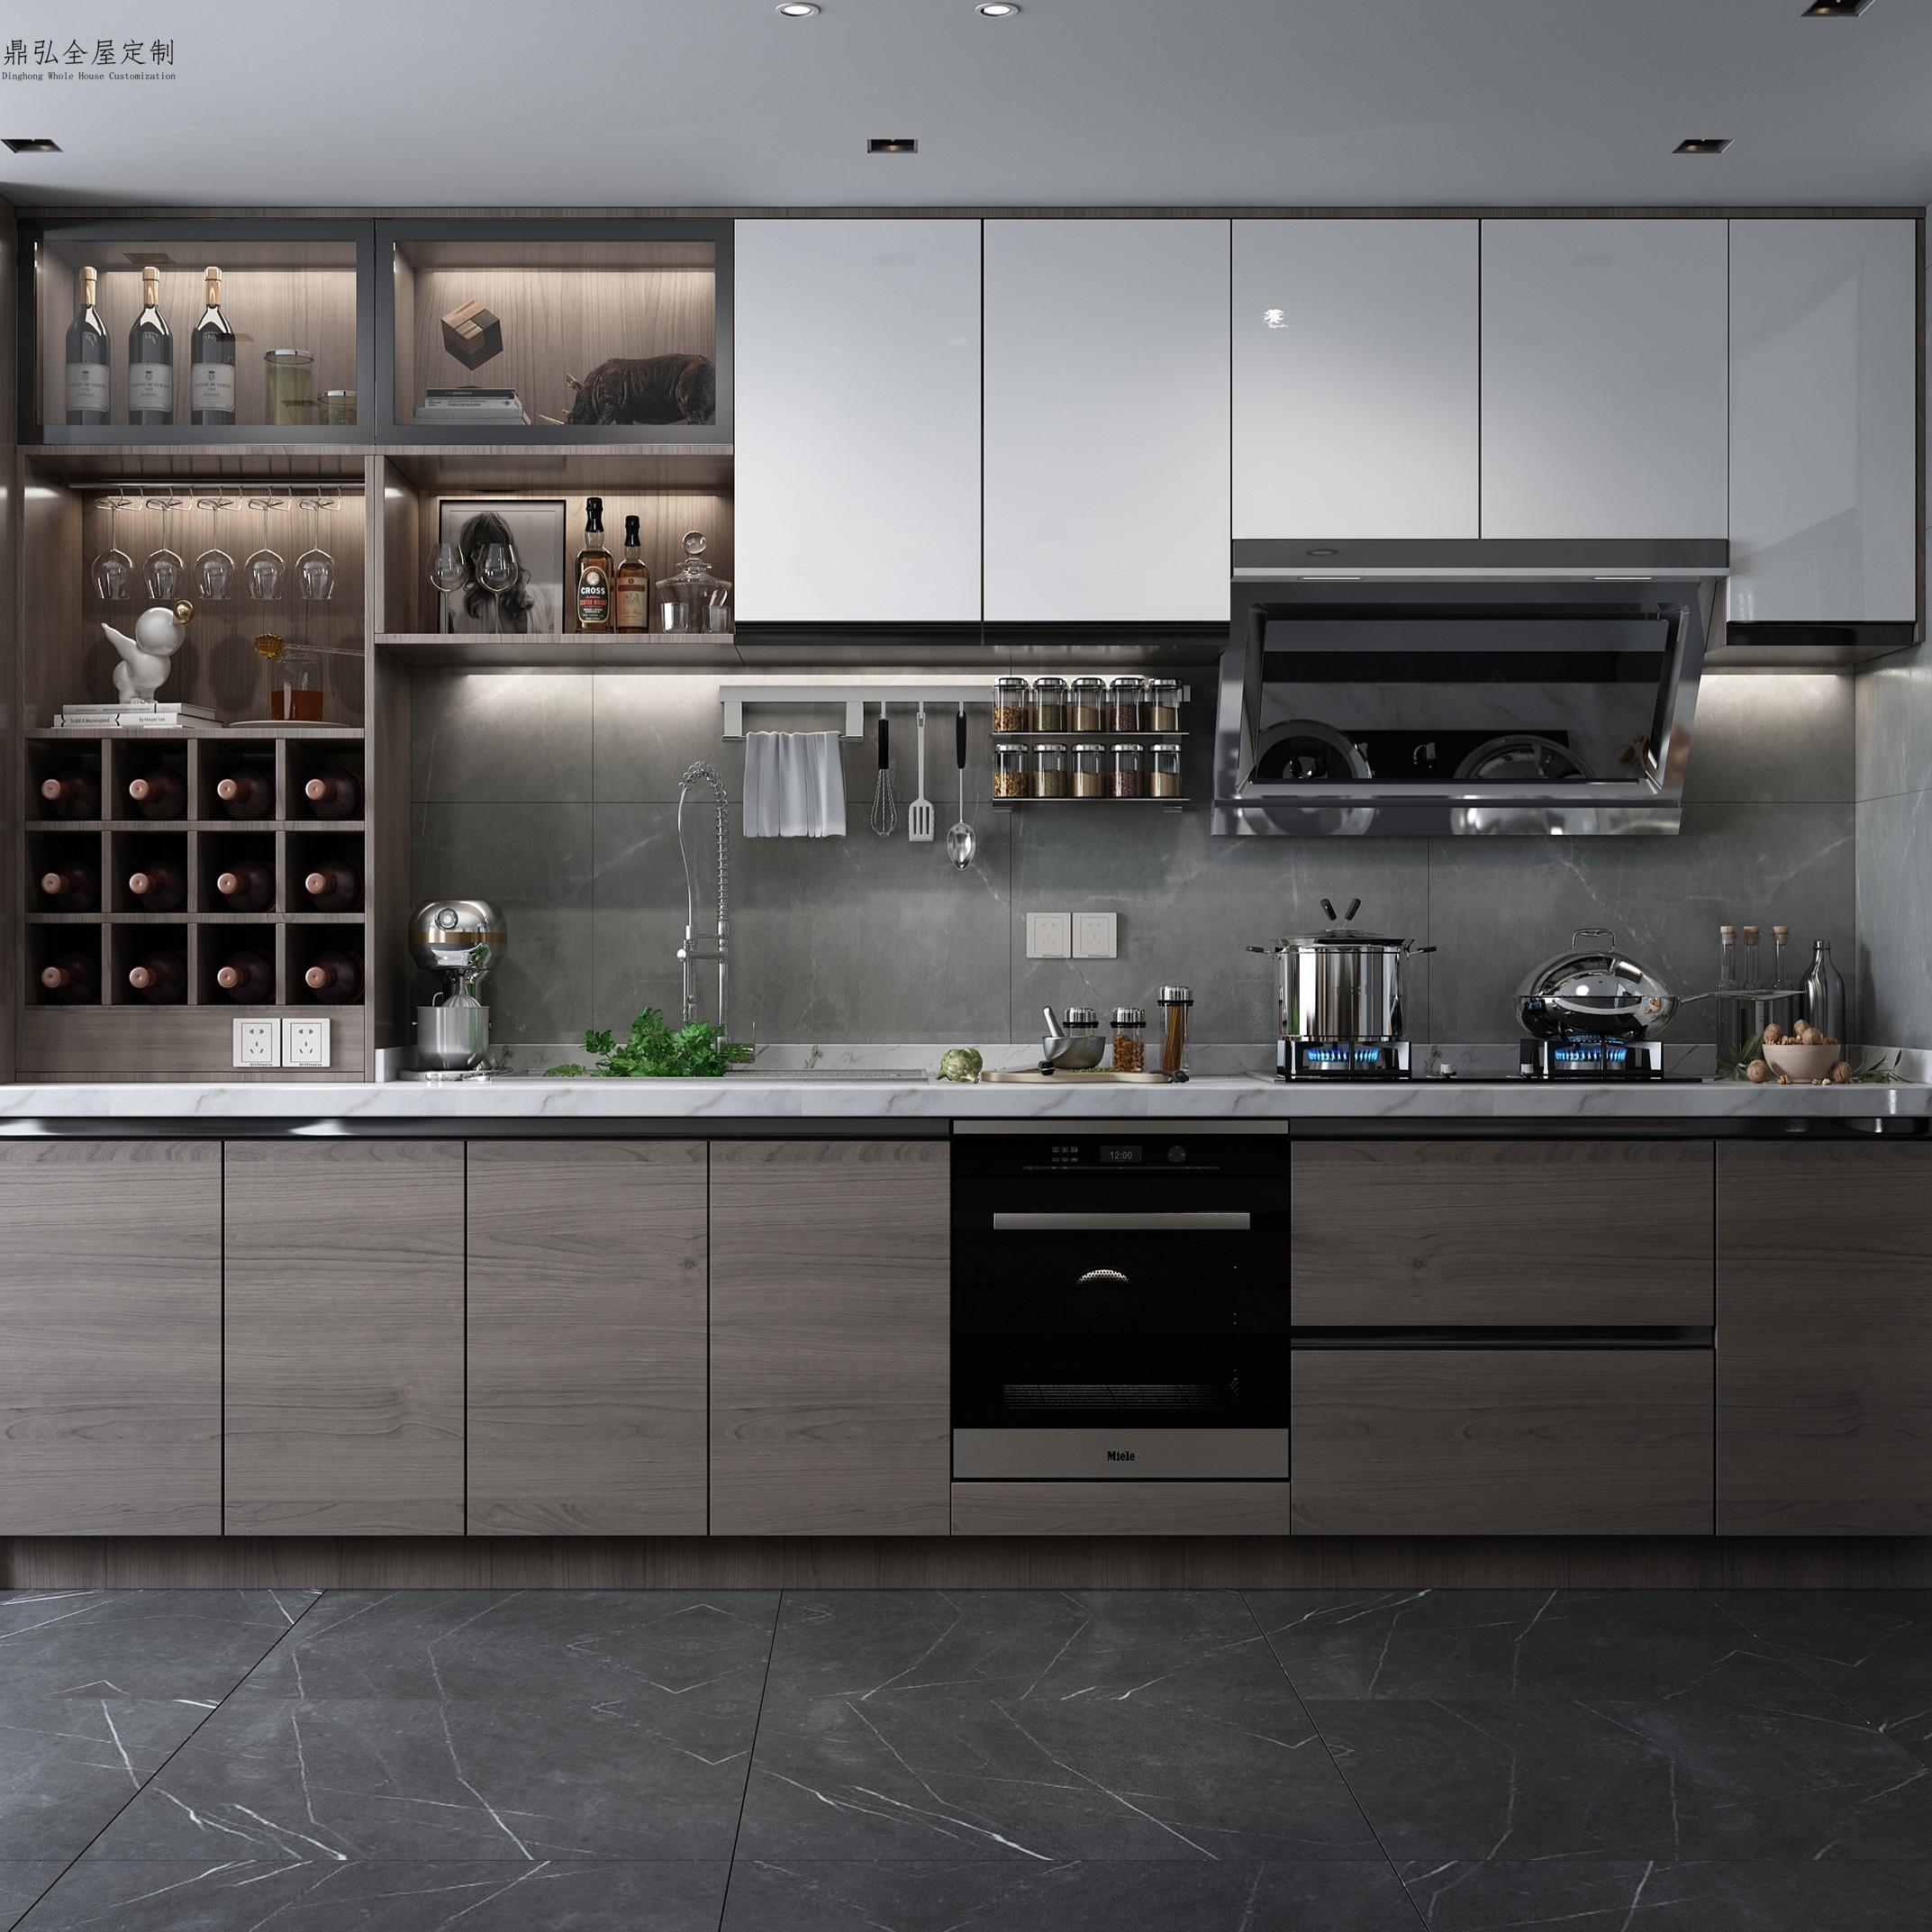 Hangzhou light luxury open kitchen overall solid wood cabinet design customization modern simple kitchen cabinet whole room customization